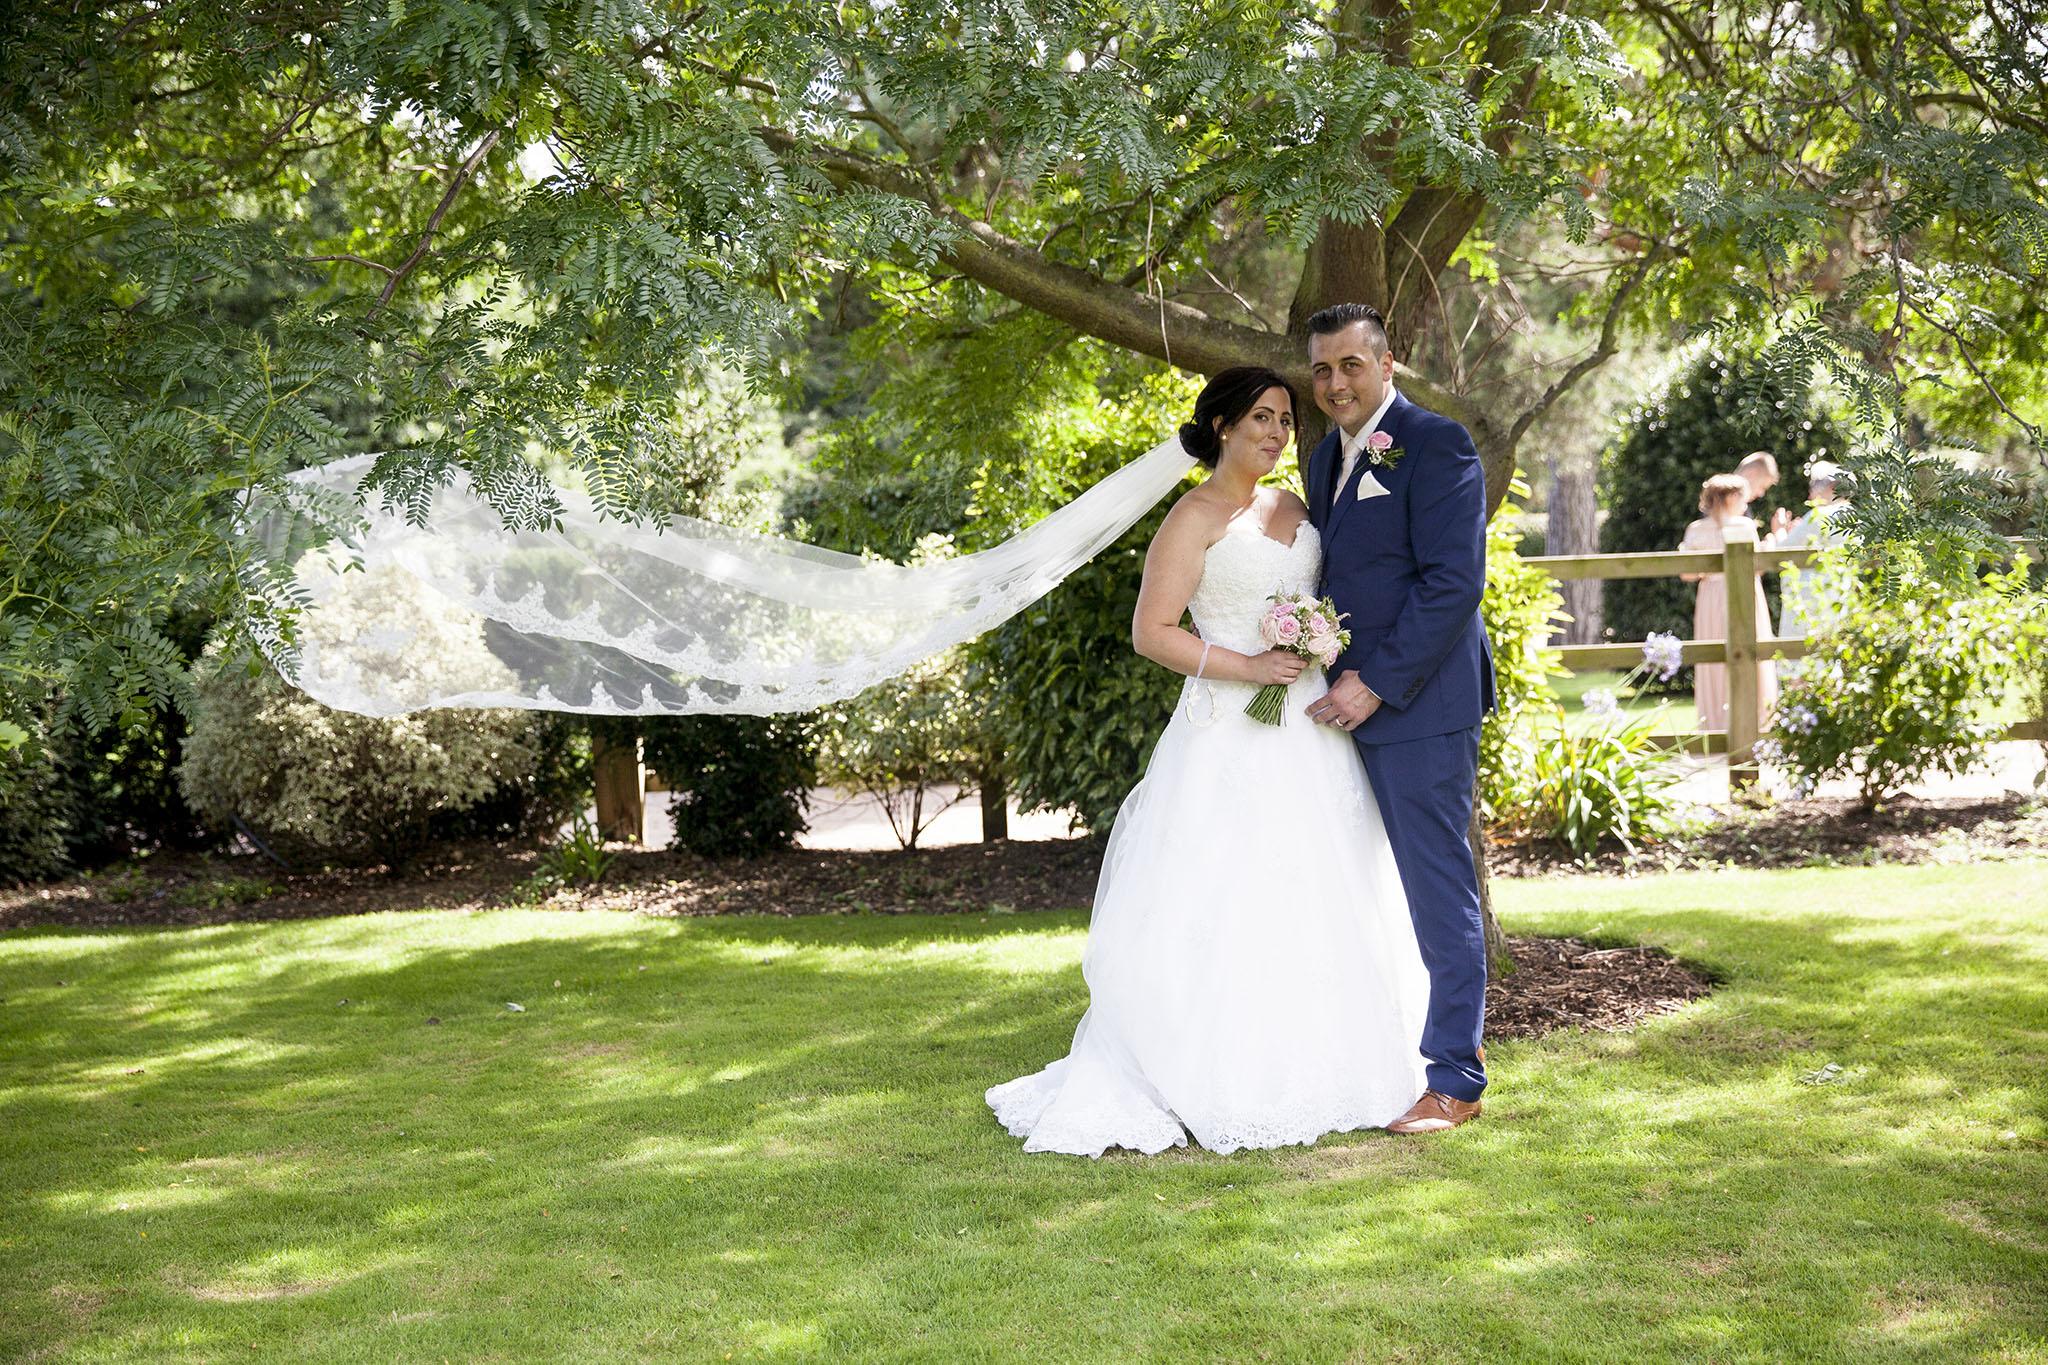 elizabethgphotography_kingslangley_hertfordshire_fineart_wedding_tewinbury_farm_tayna_21.jpg